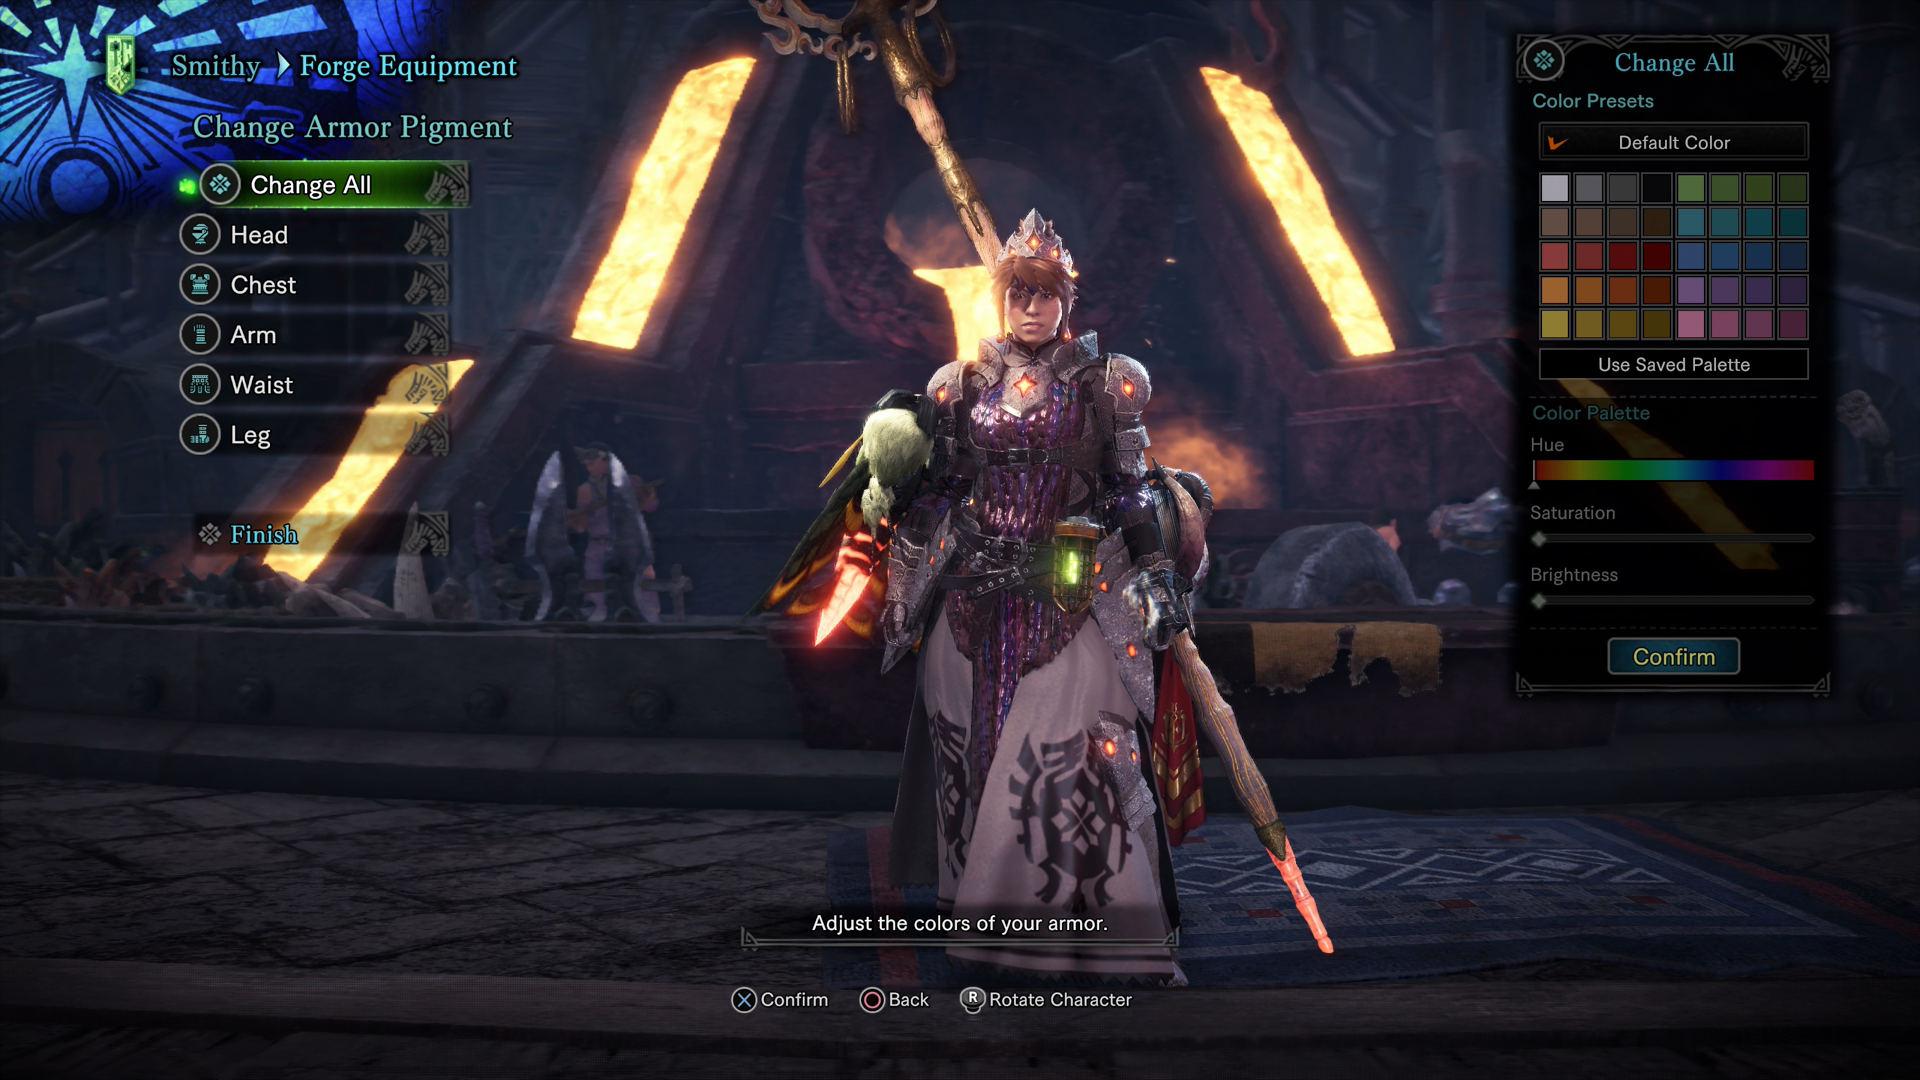 Mhw Zorah Layered Armor Set How To Unlock